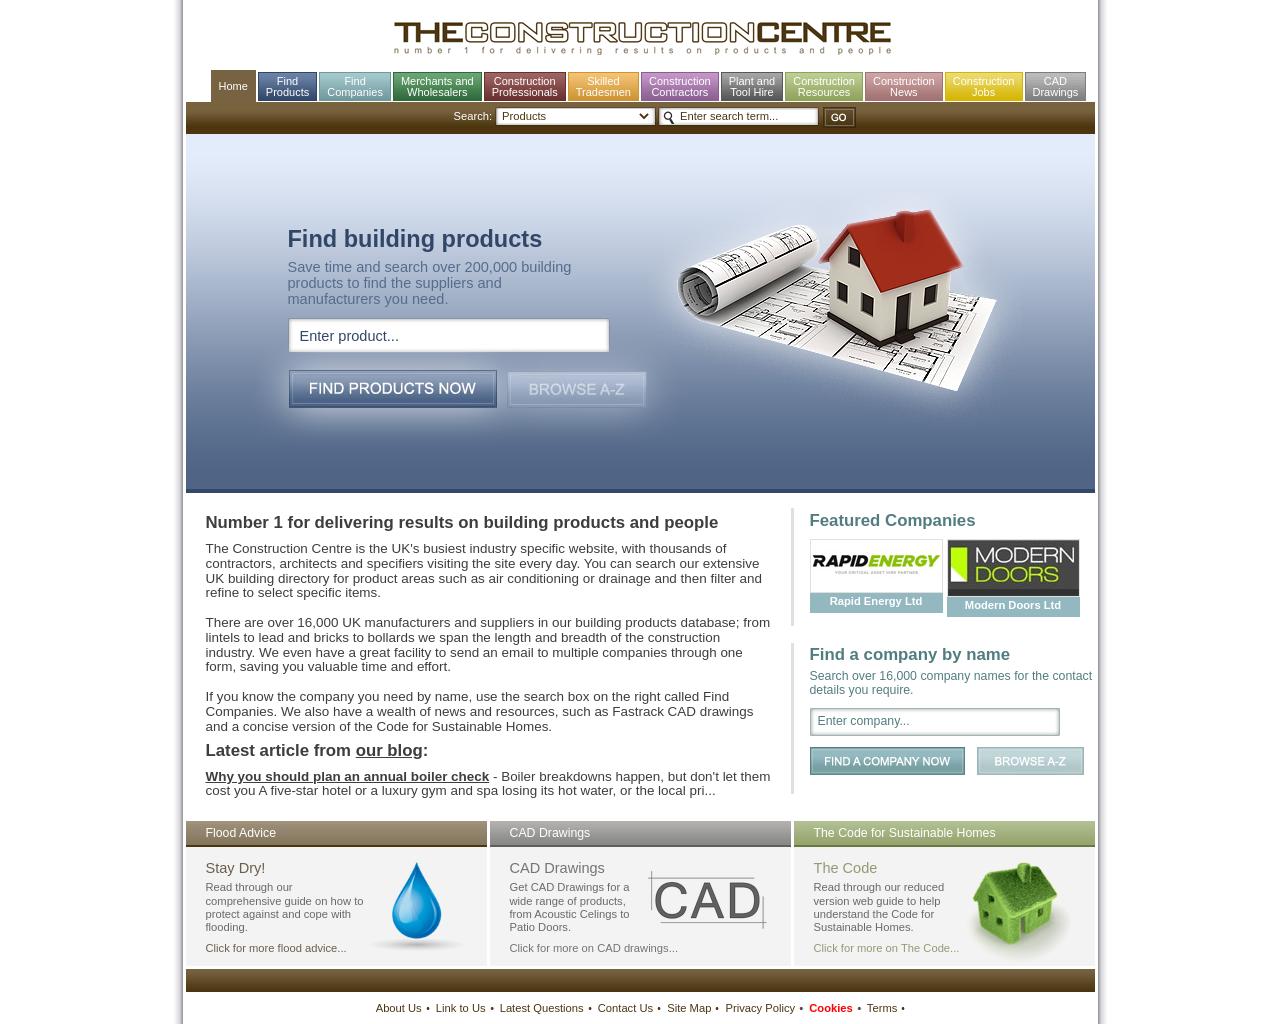 theconstructioncentre.co.uk